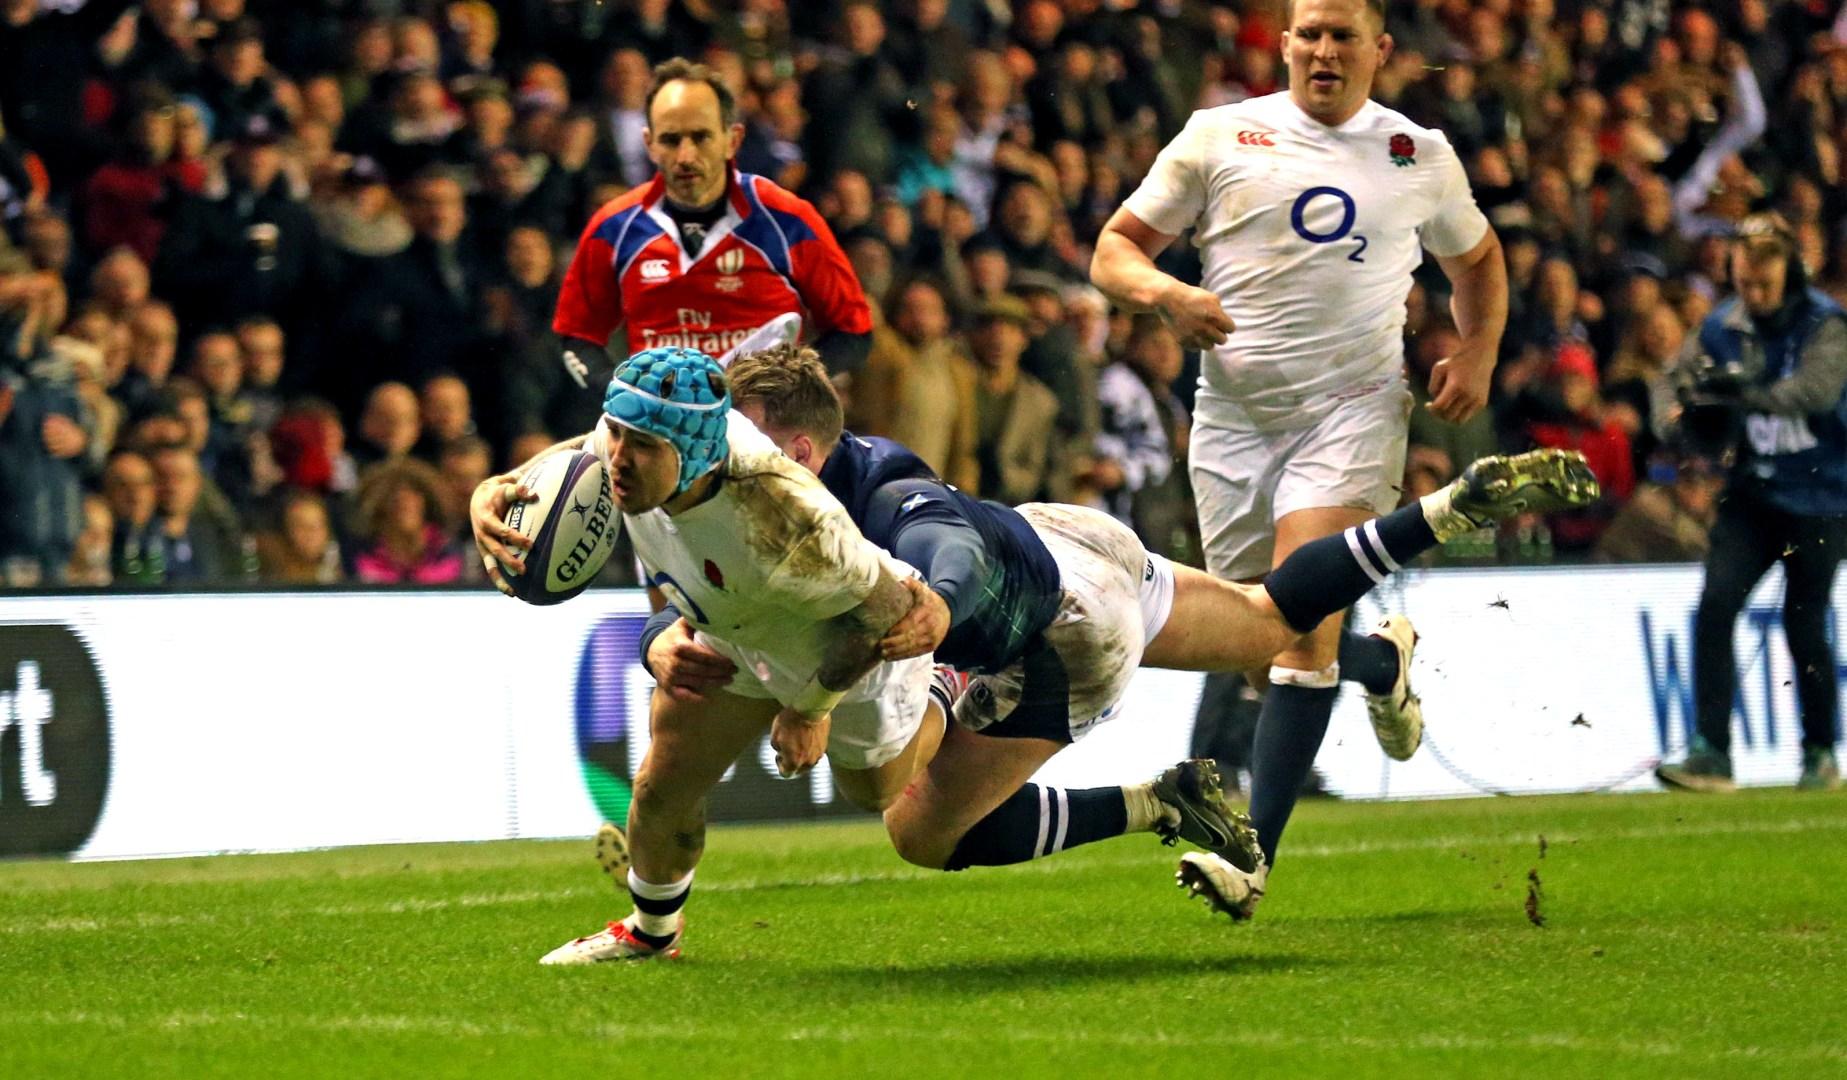 Lions report: Eddie Jones's England era begins with victory